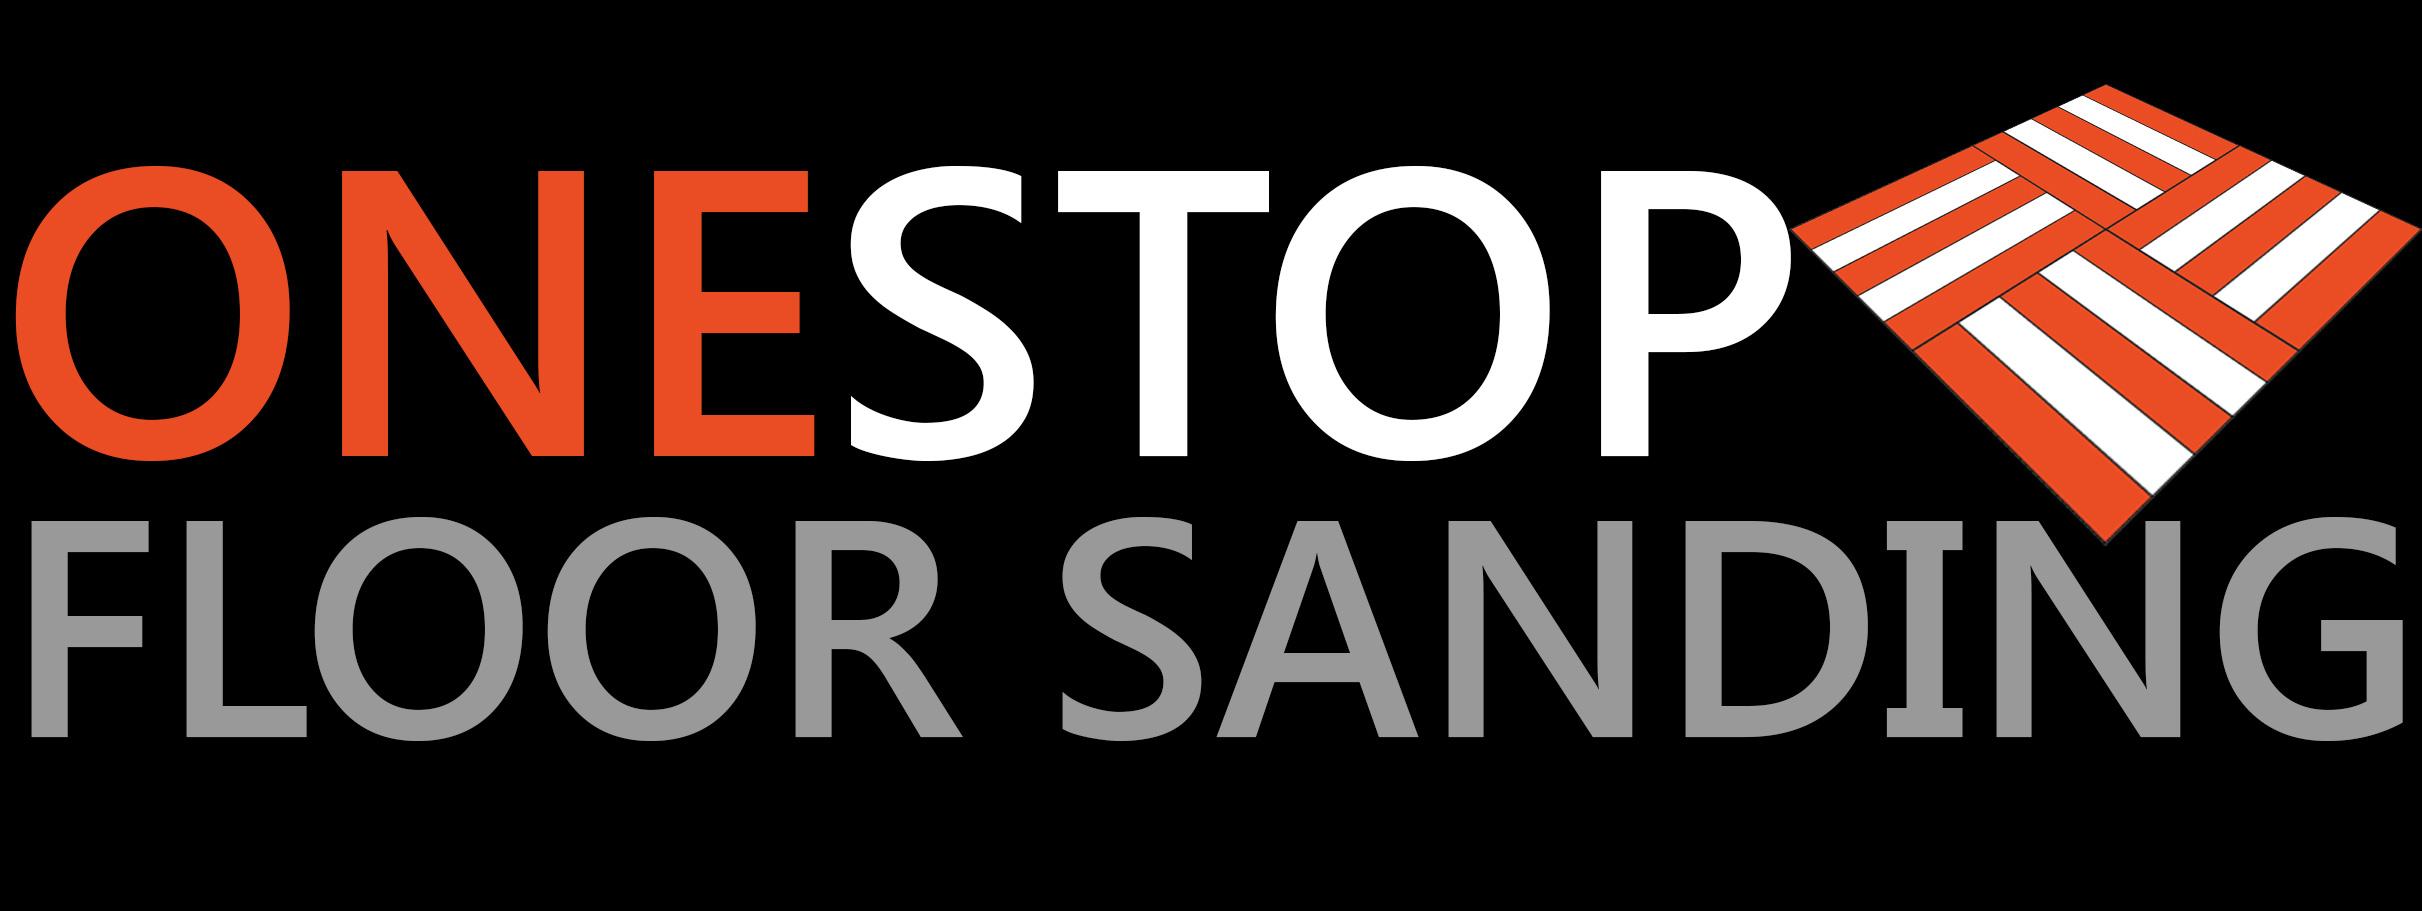 One-Stop-Floor-Sanding-Logo.jpg